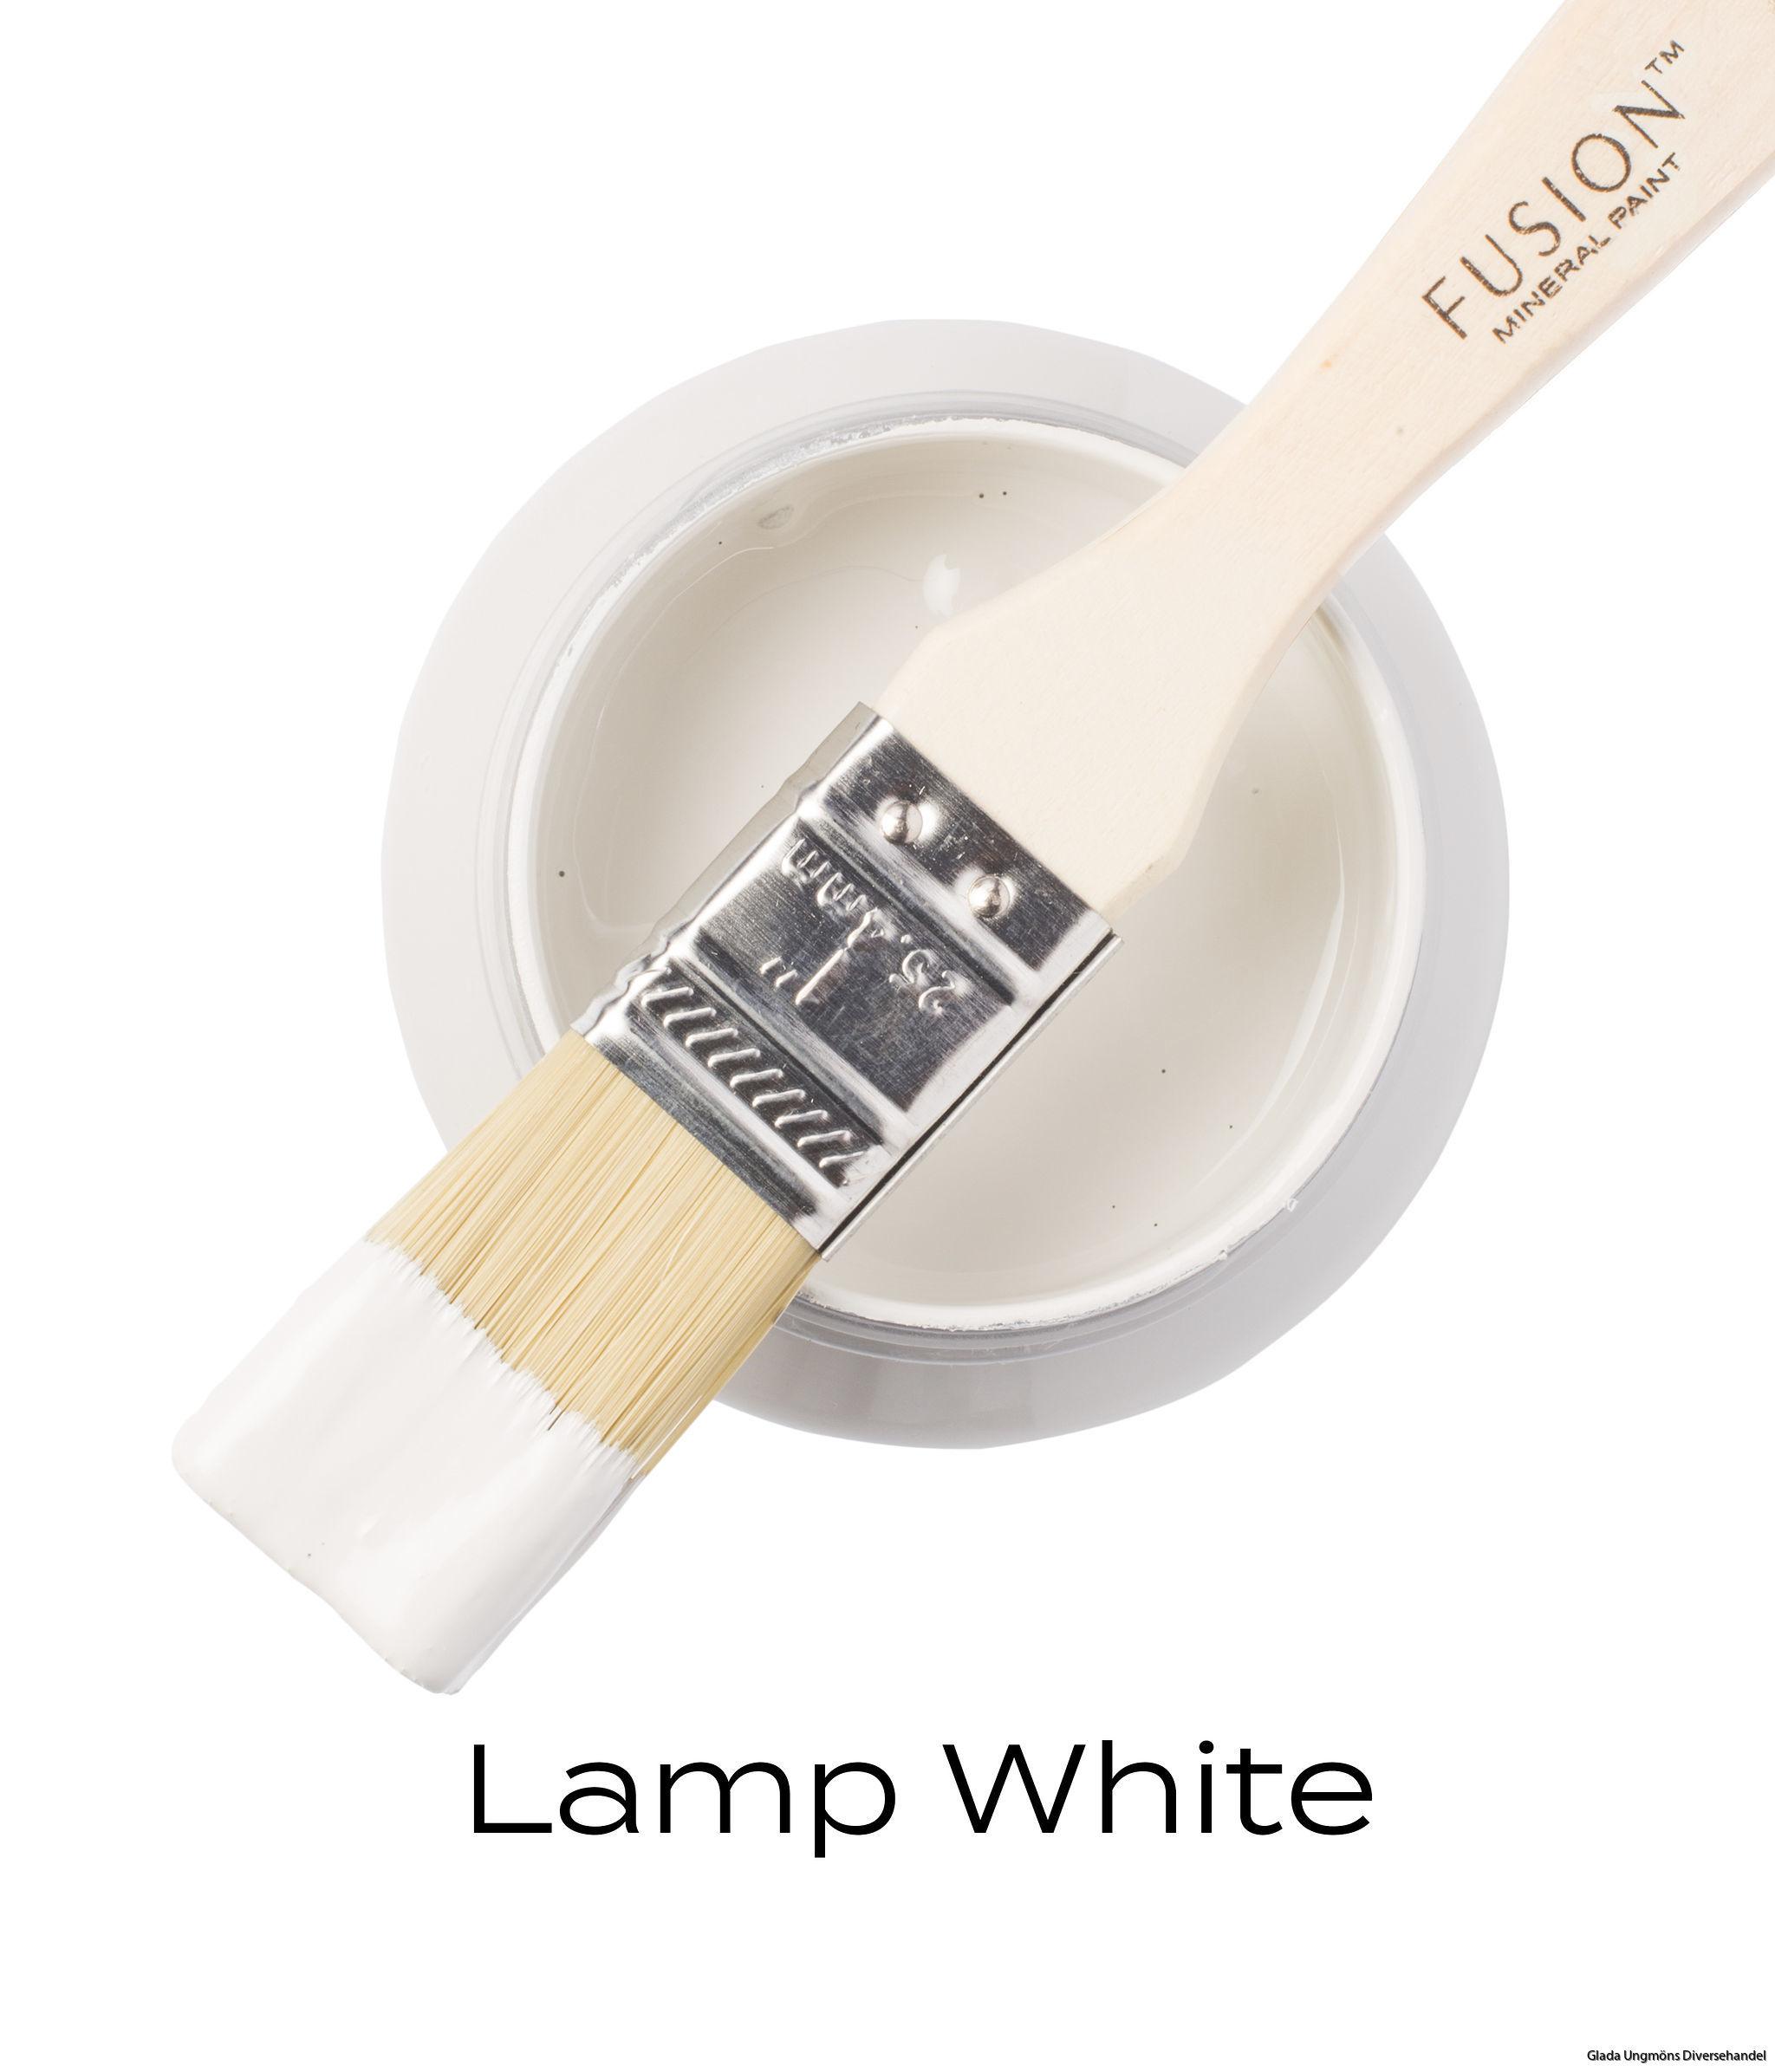 T1LAMPWHITE